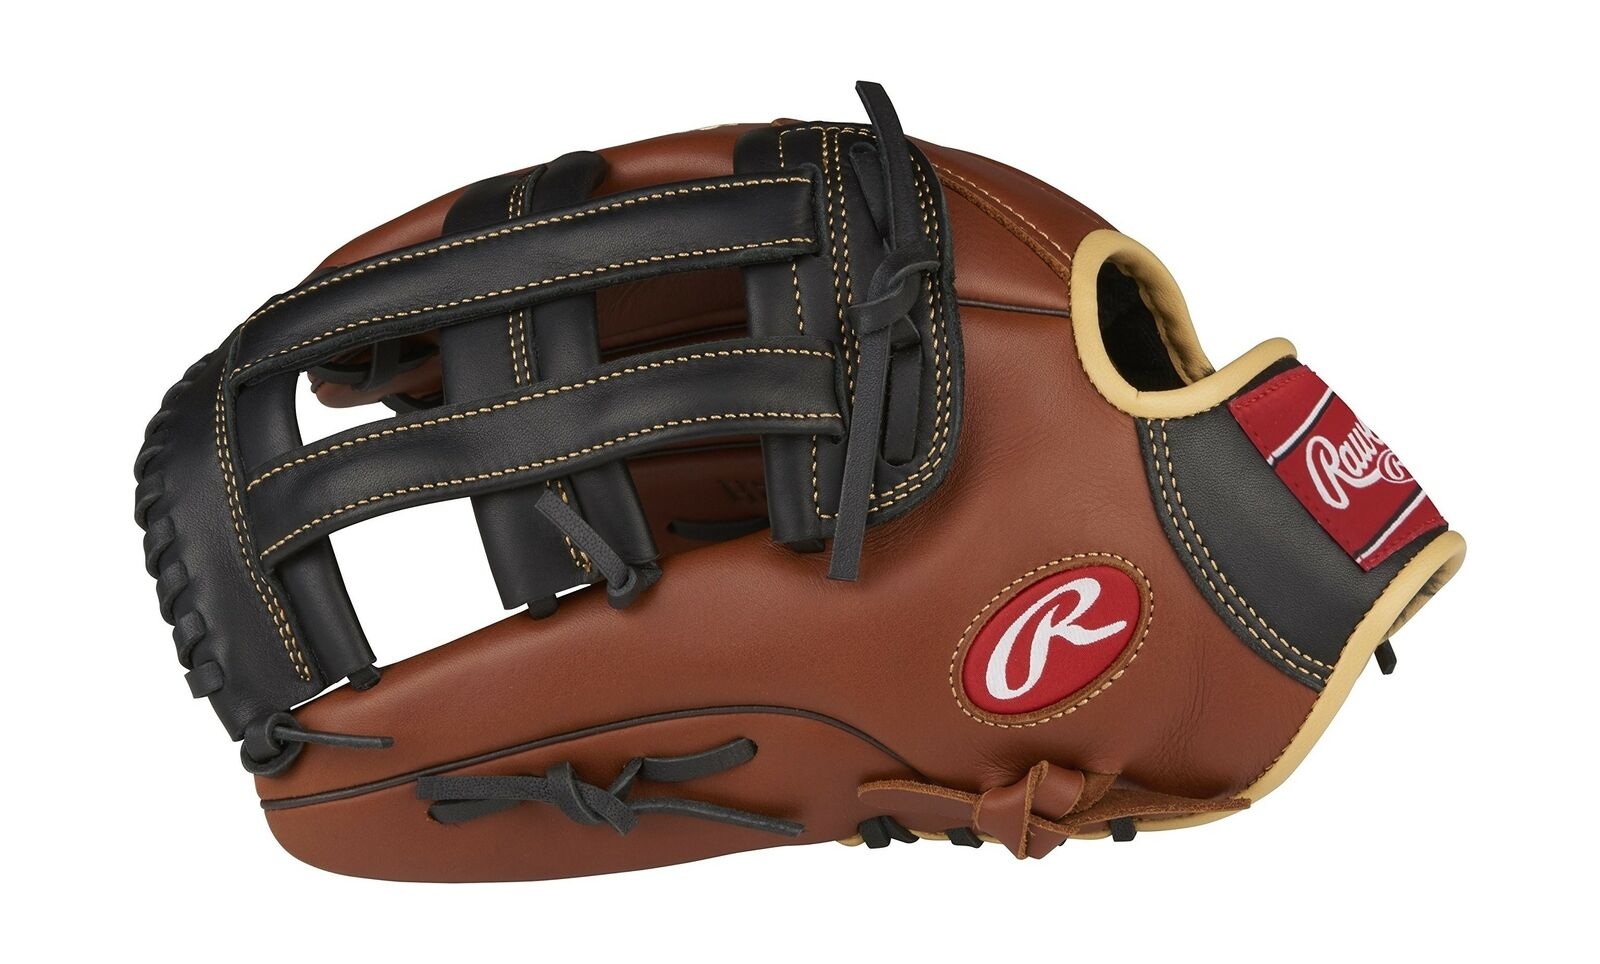 Rawlings Serie  Sandlot Guante de béisbol Left Hand Throw  outfield   tienda de venta